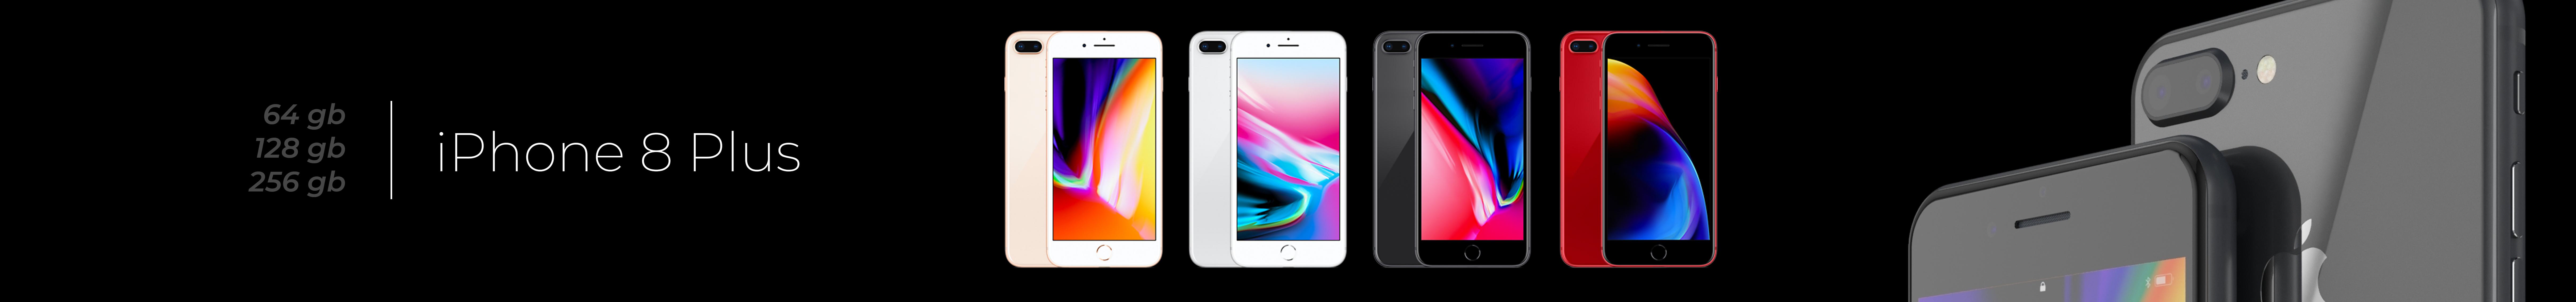 Móvil Open Box para iPhone 8 Plus